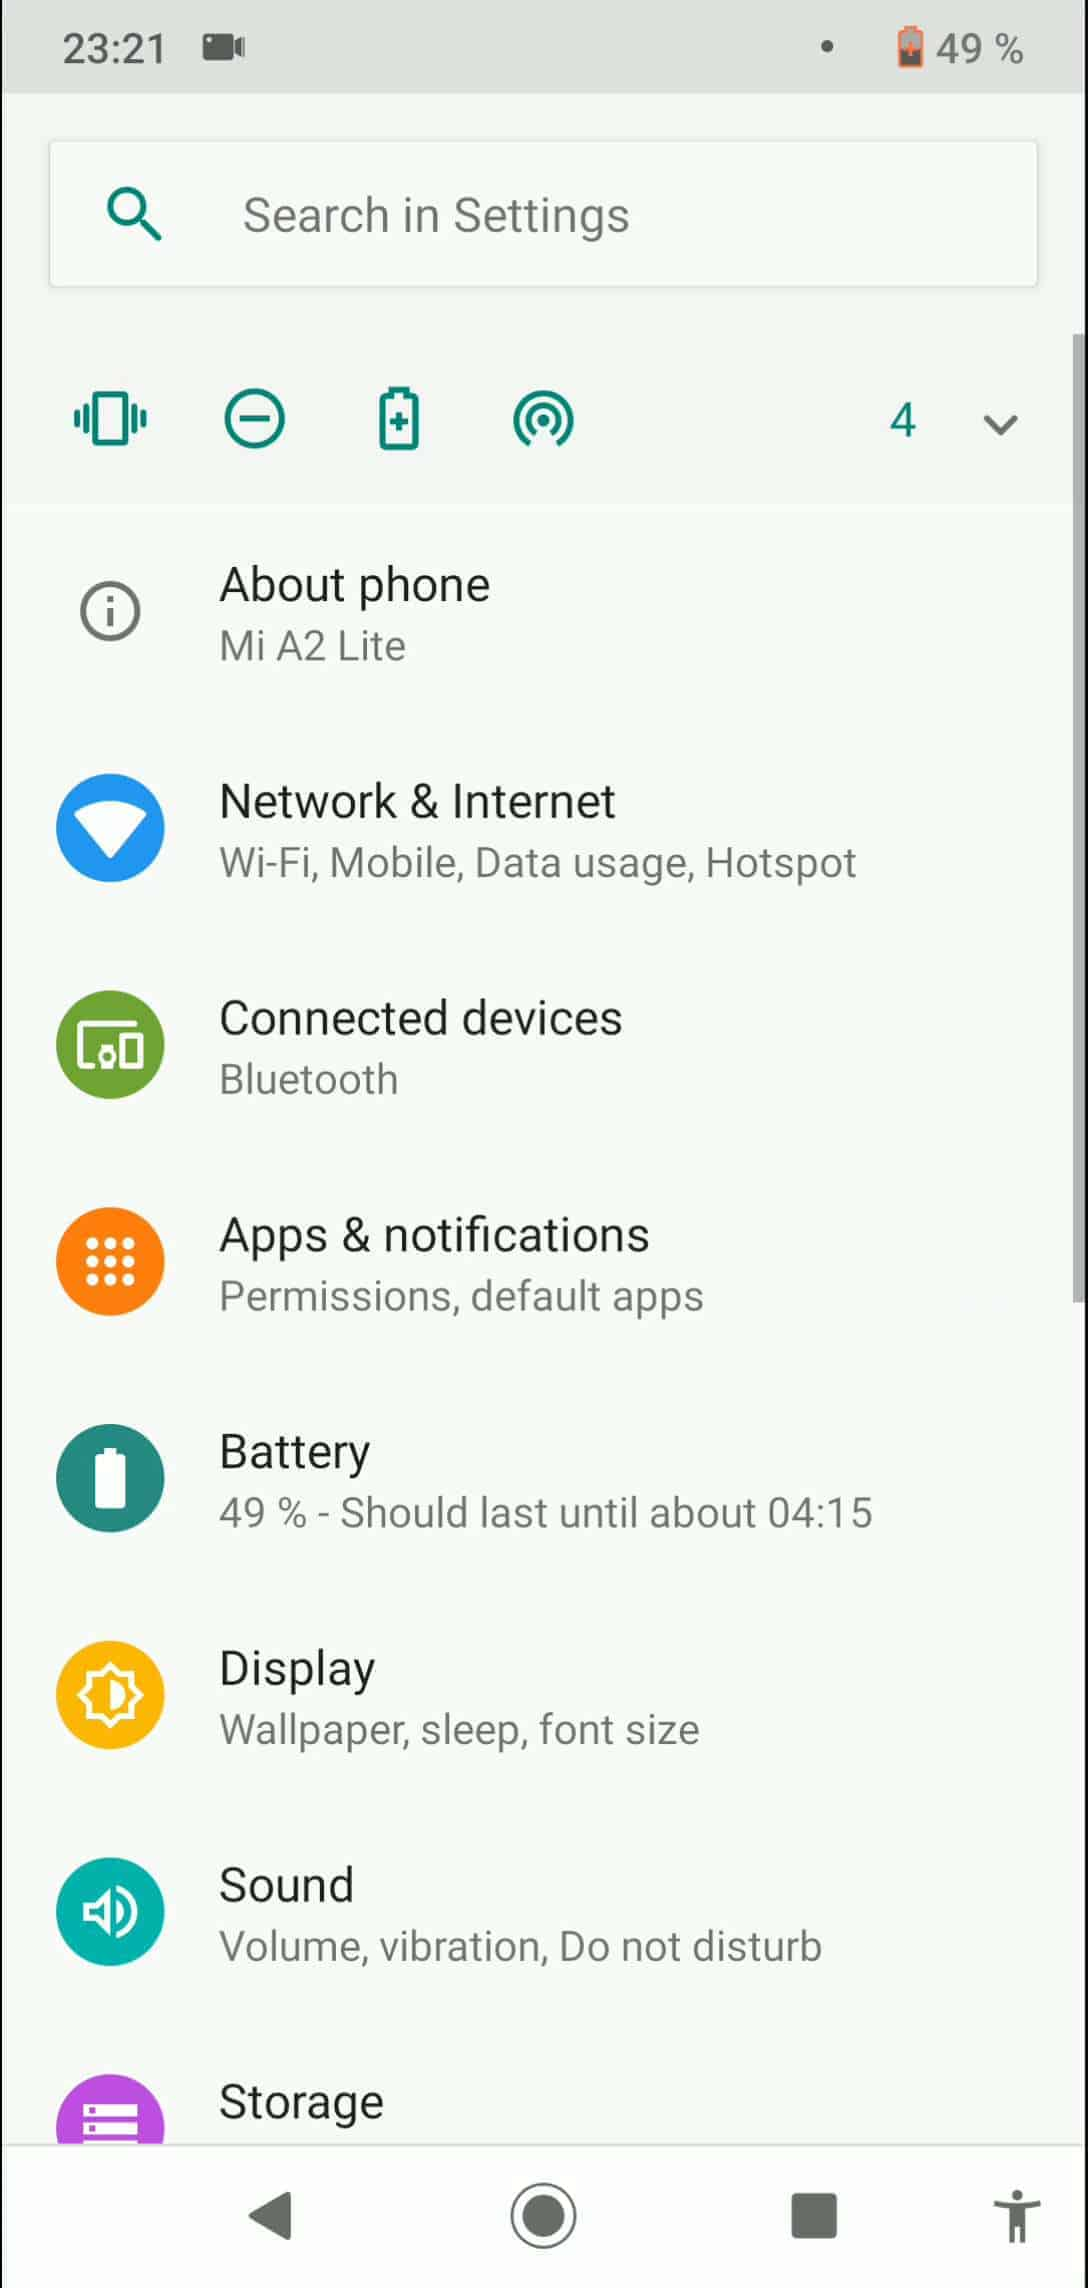 Step 2: Tap on Network & Internet